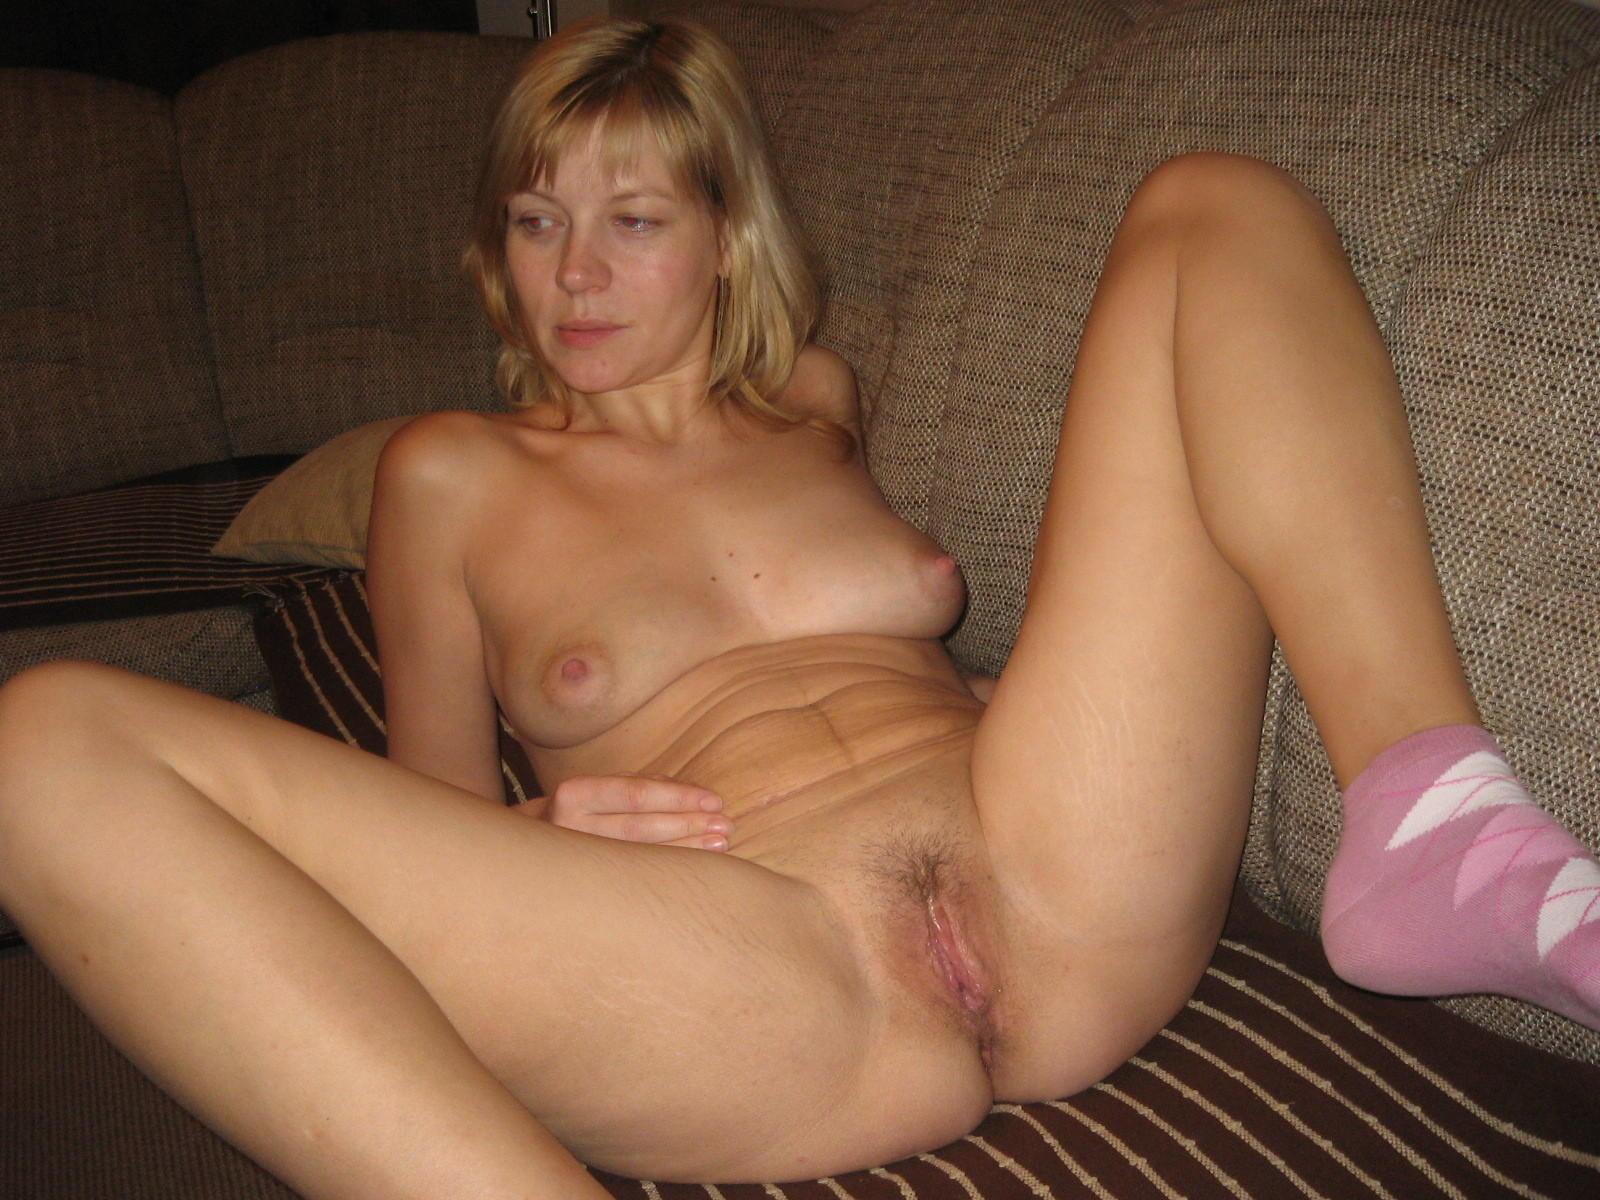 Busty mature women spread nude